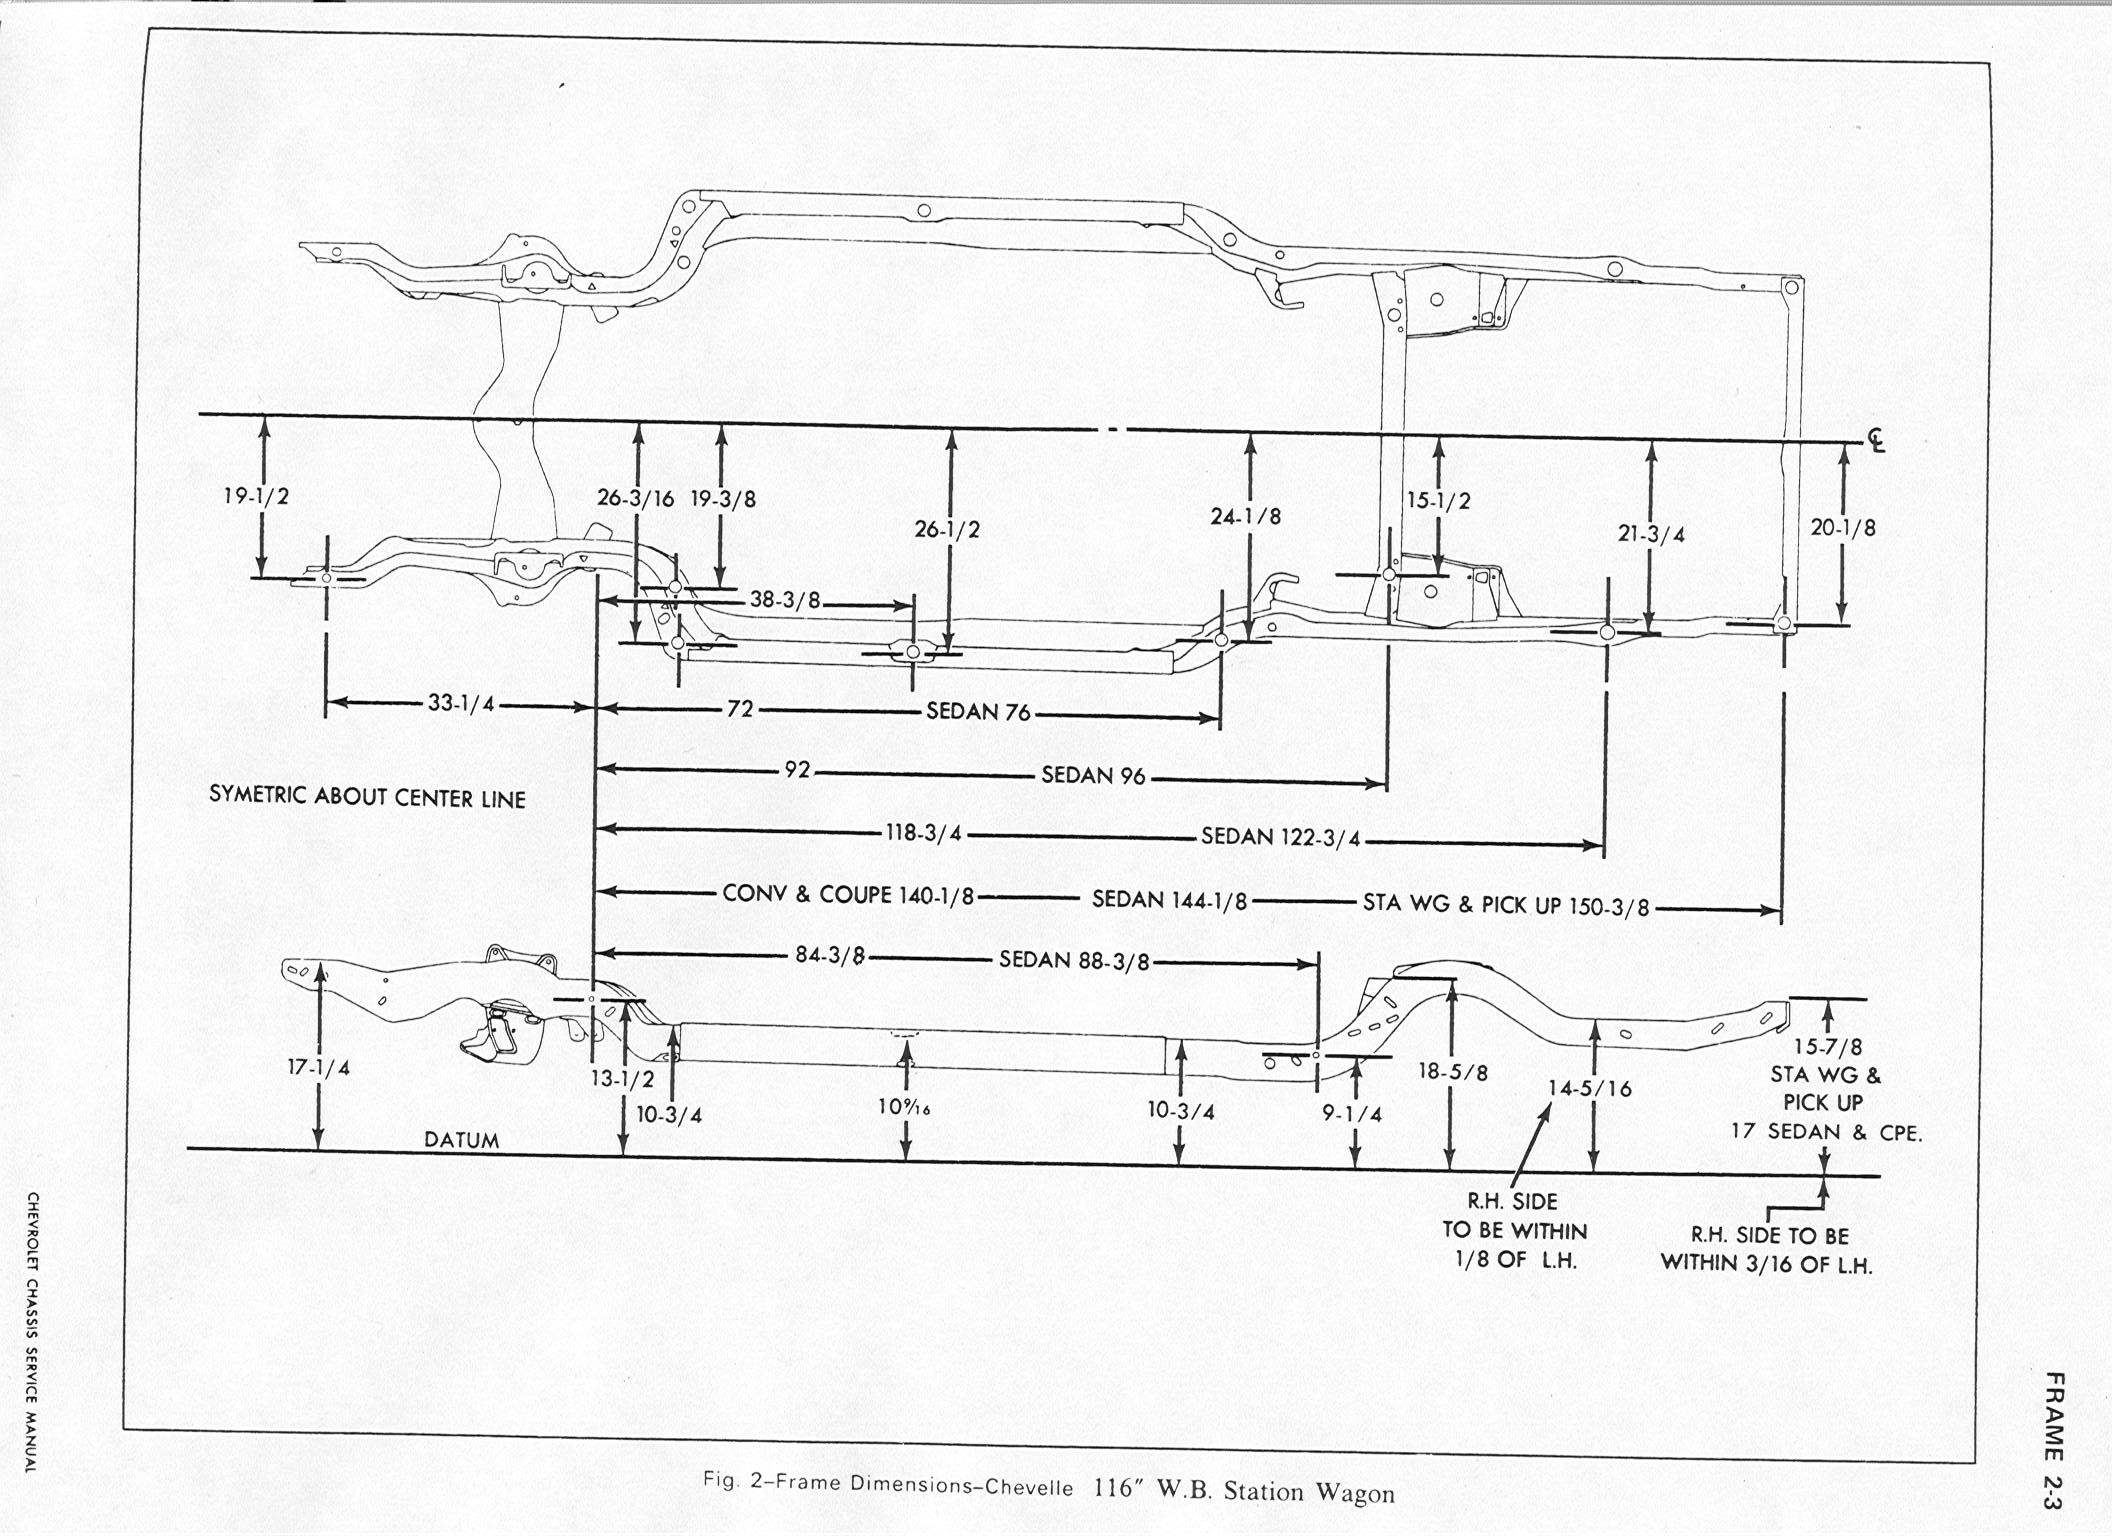 2006 Acura Tl Wiring Pdf 1970 Chevelle Frame Measurements Chevelle Tech